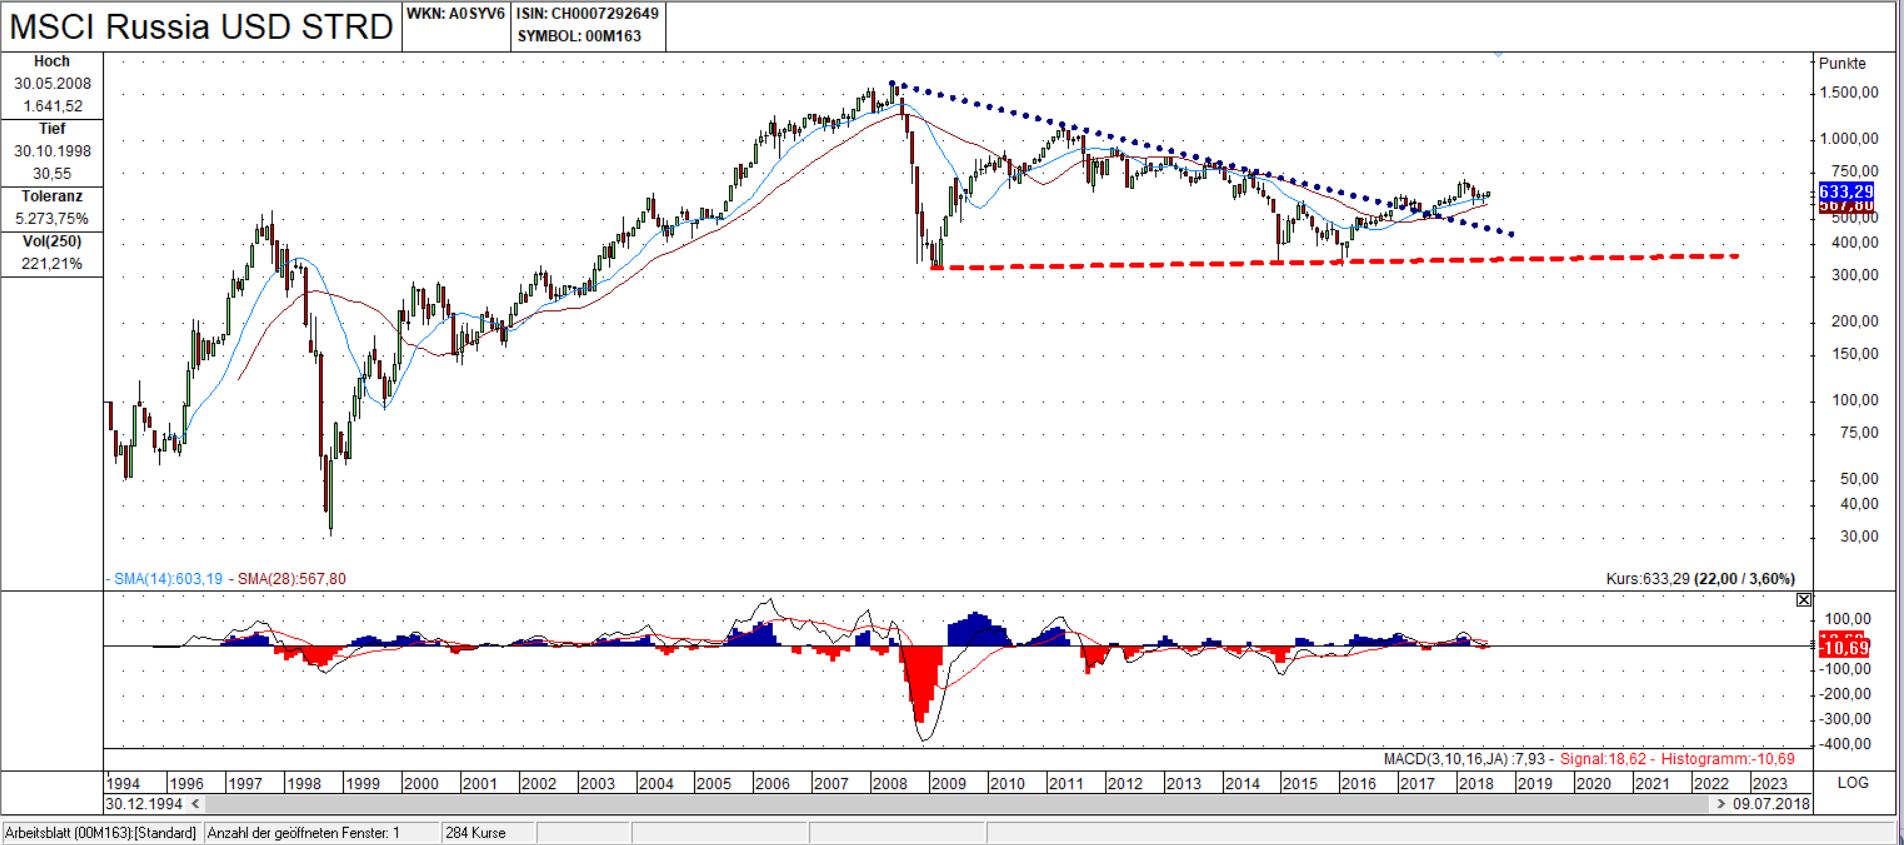 MSCI Russia Candle Chart: Ausbruch aus dem 3eck scheint stabil zu sein